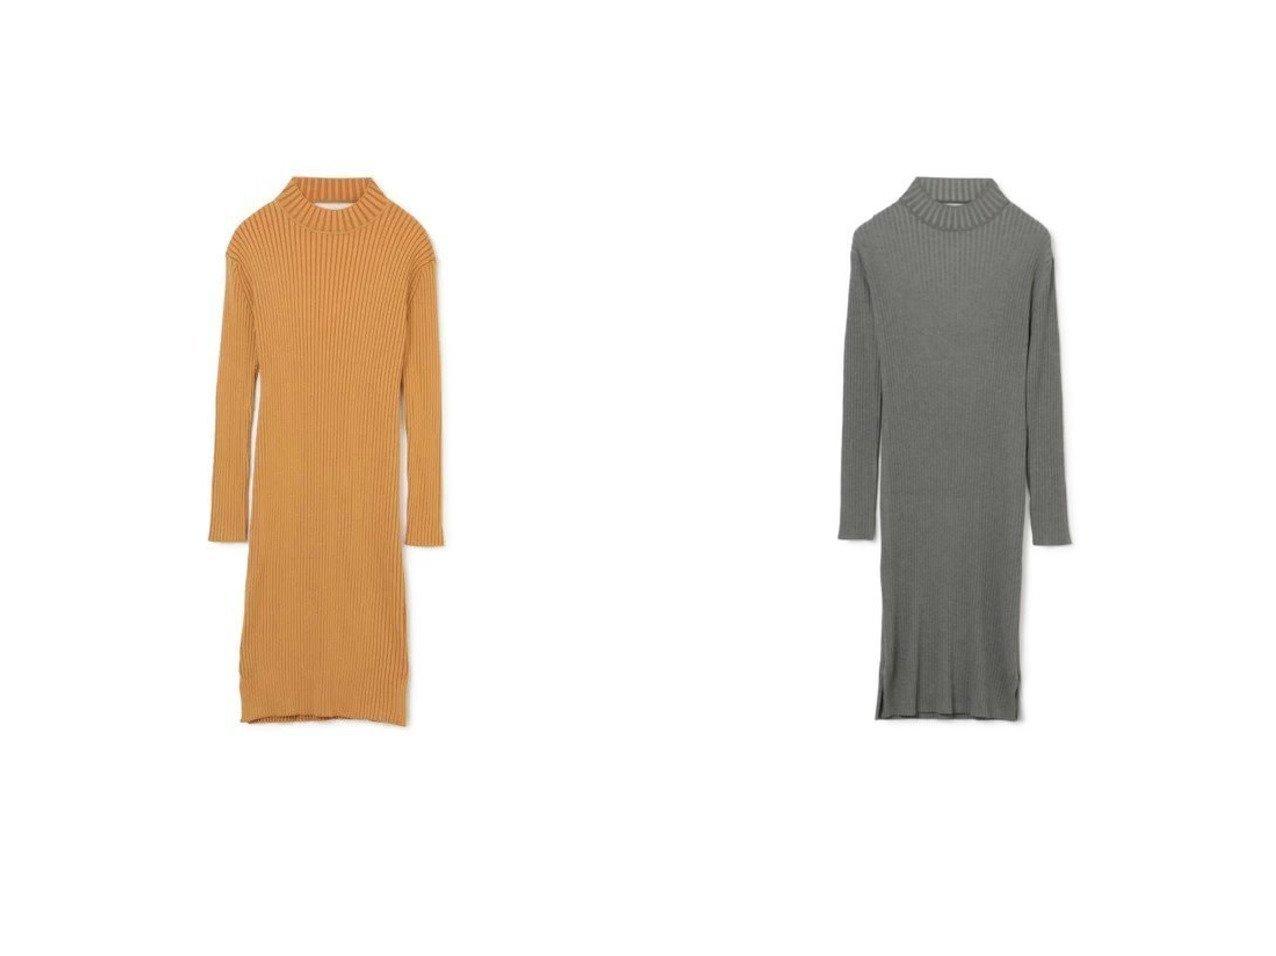 【LE CIEL BLEU/ルシェル ブルー】のTwist Rib Knit Dress 【ワンピース・ドレス】おすすめ!人気、トレンド・レディースファッションの通販  おすすめで人気の流行・トレンド、ファッションの通販商品 メンズファッション・キッズファッション・インテリア・家具・レディースファッション・服の通販 founy(ファニー) https://founy.com/ ファッション Fashion レディースファッション WOMEN ワンピース Dress ドレス Party Dresses ニットワンピース Knit Dresses シンプル スリット ツイスト ドレス ハイネック フォーマル フロント 長袖  ID:crp329100000033361